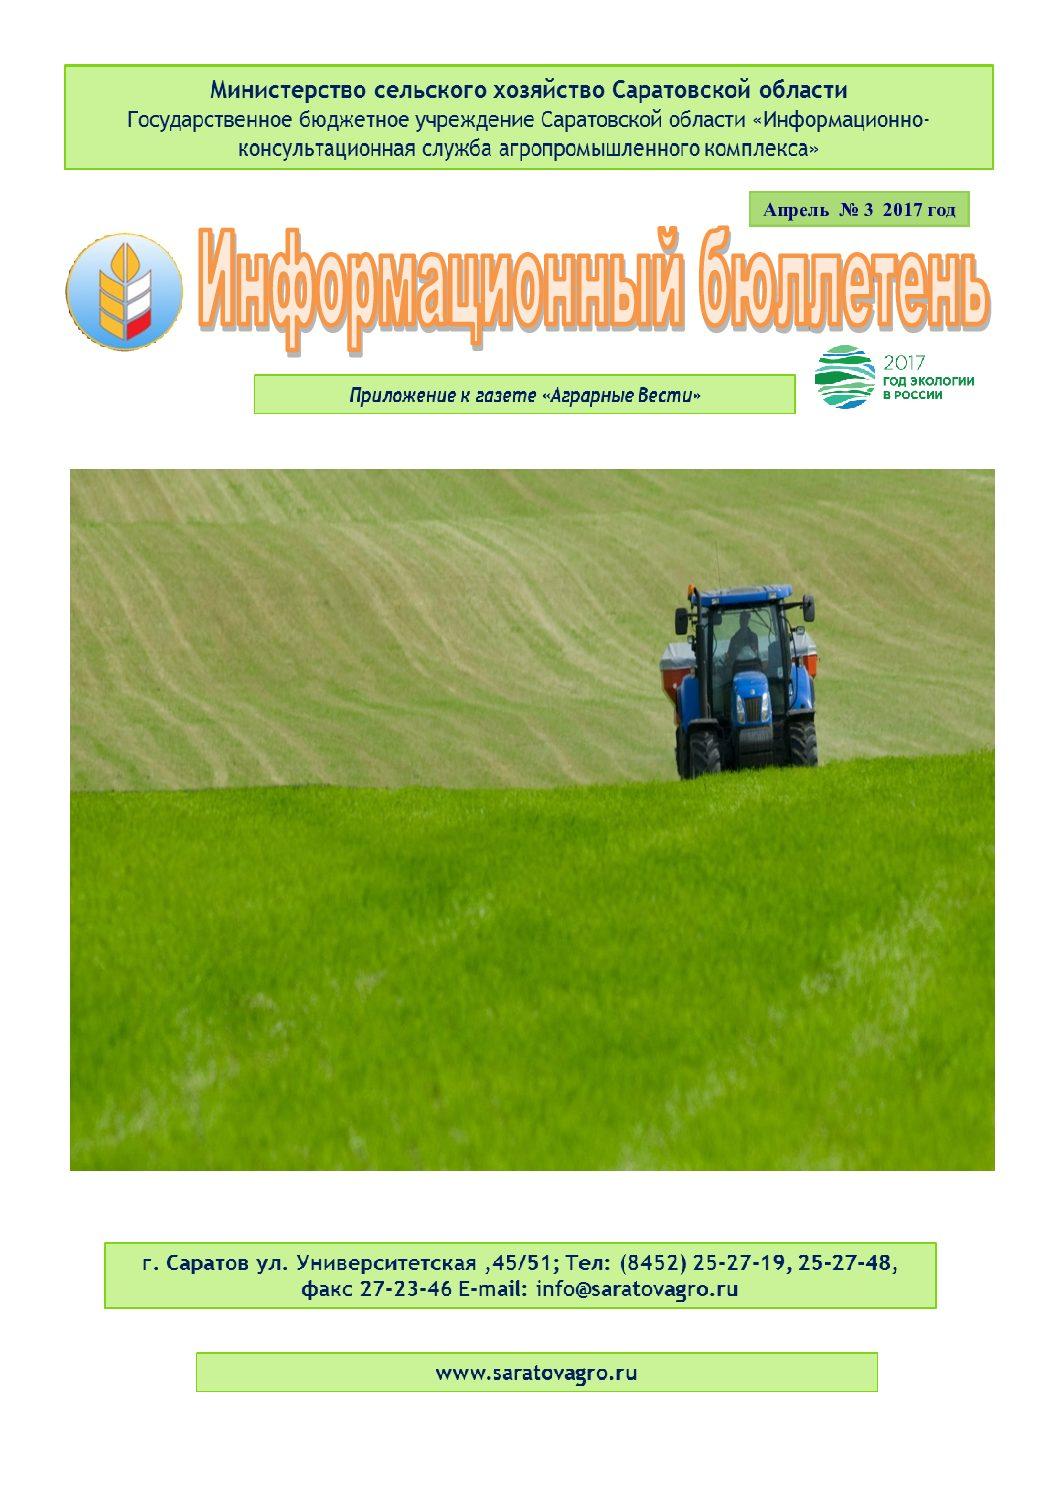 https://saratovagro.ru/wp-content/uploads/2020/08/бюллетень-№3-апрель-pdf.jpg